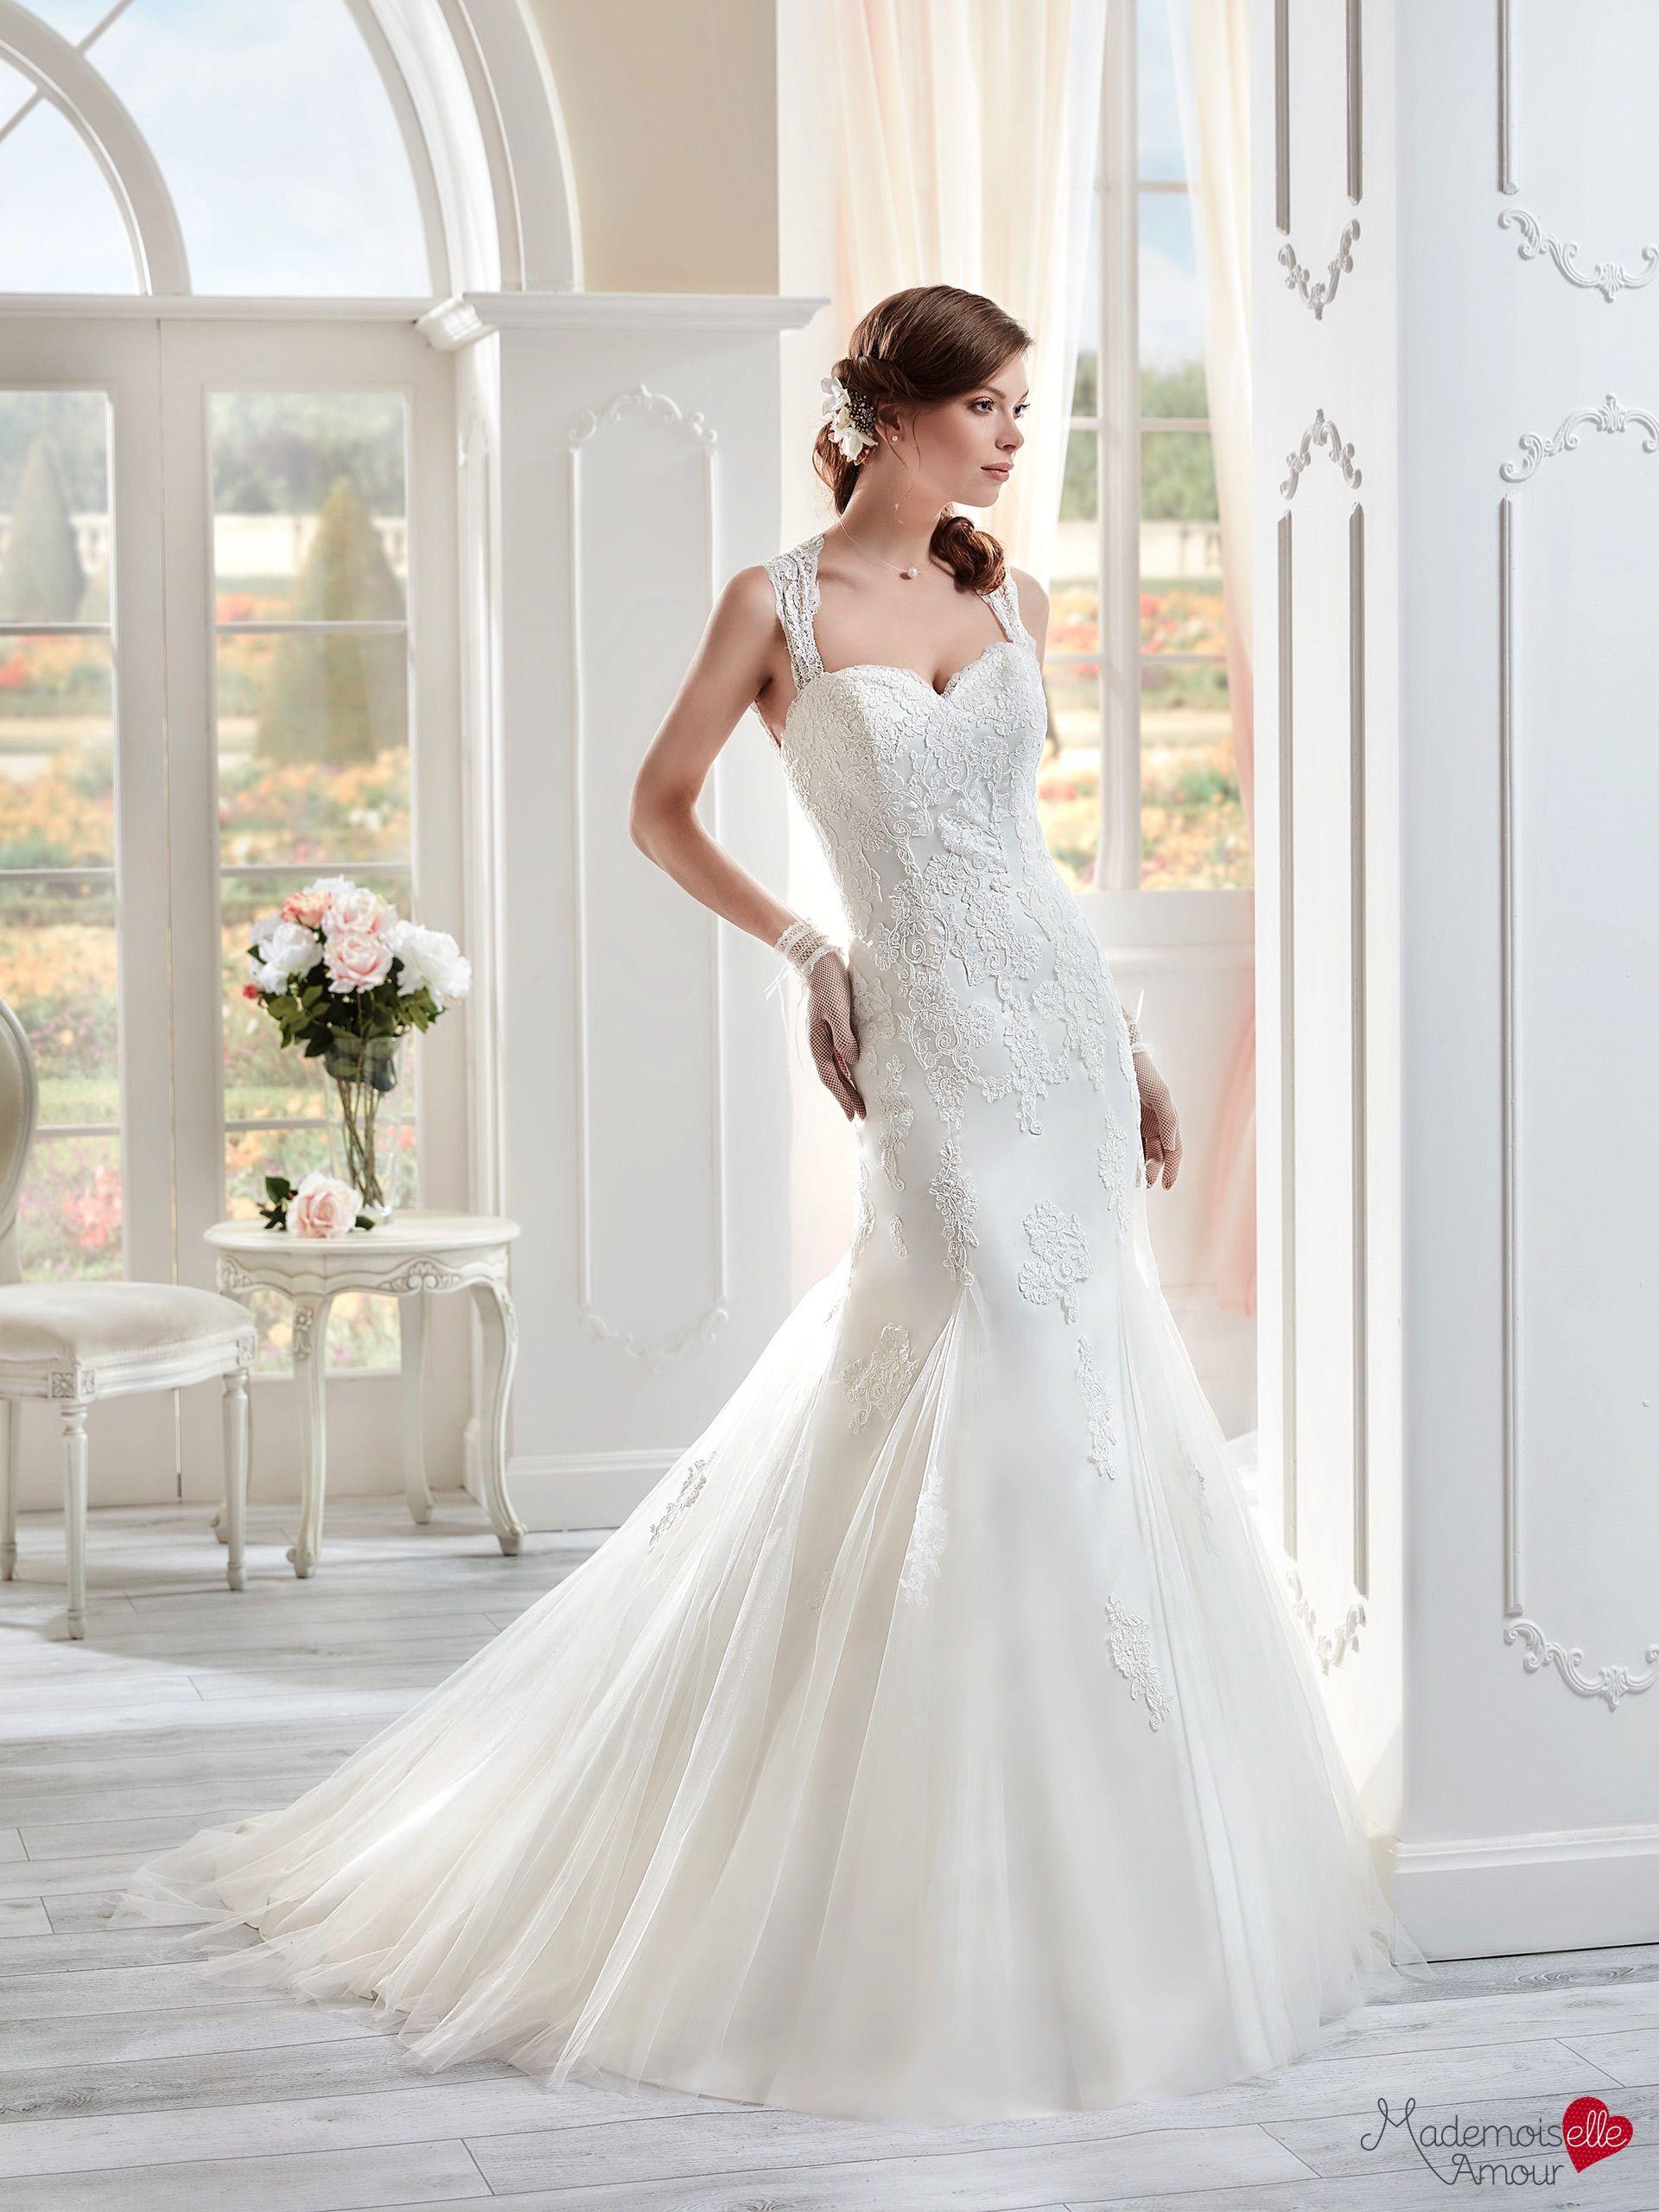 Robe de mariée Mlle Twill, robe de mariée dentelle, robe de mariage forme sirène…